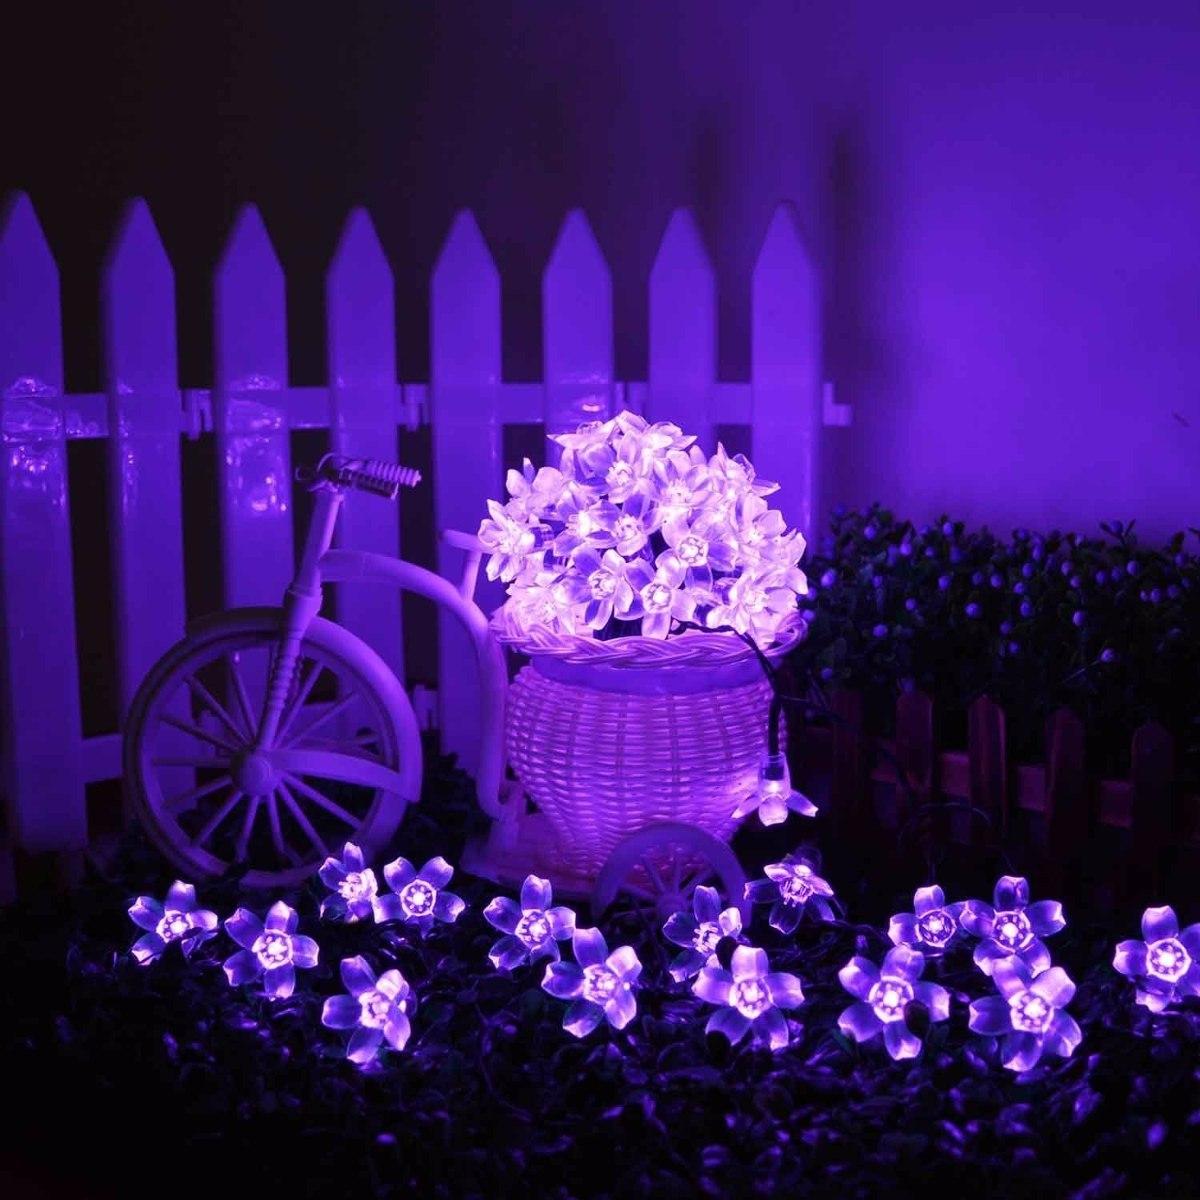 luces flores solares ft led morado para decoracion cargando zoom